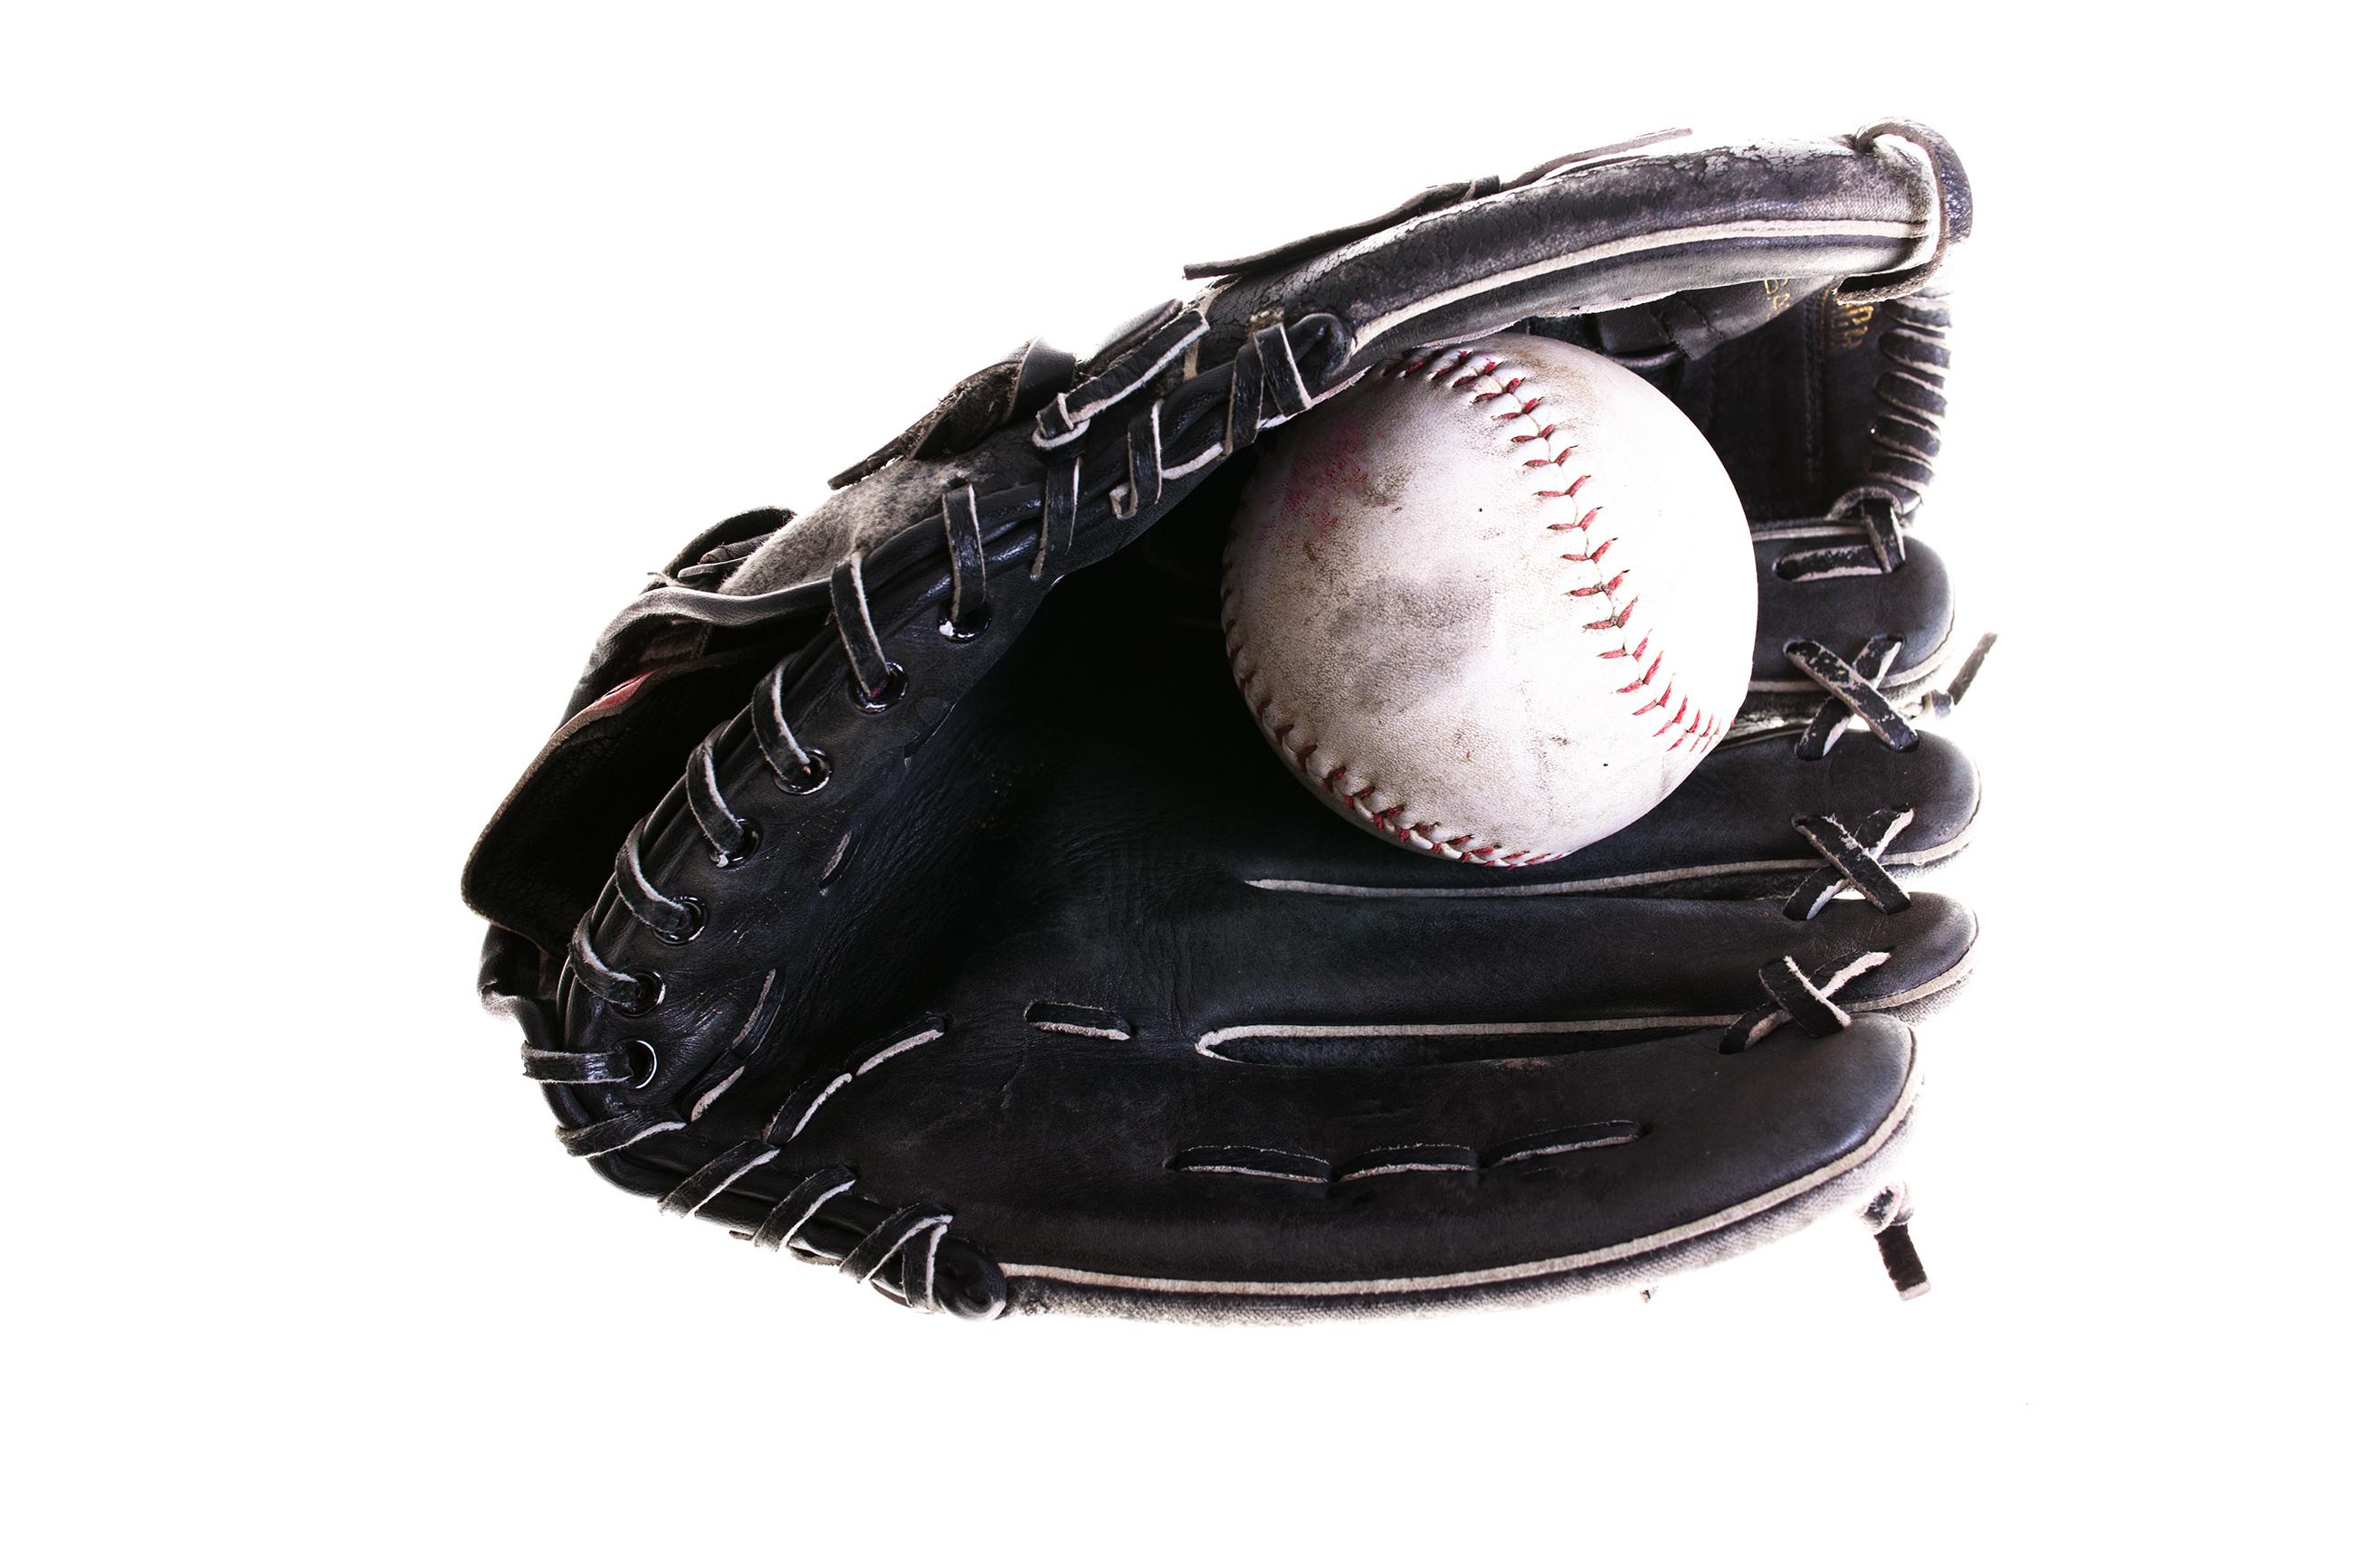 Softball and glove, Baseball, Leisure, Summer, Sports, HQ Photo